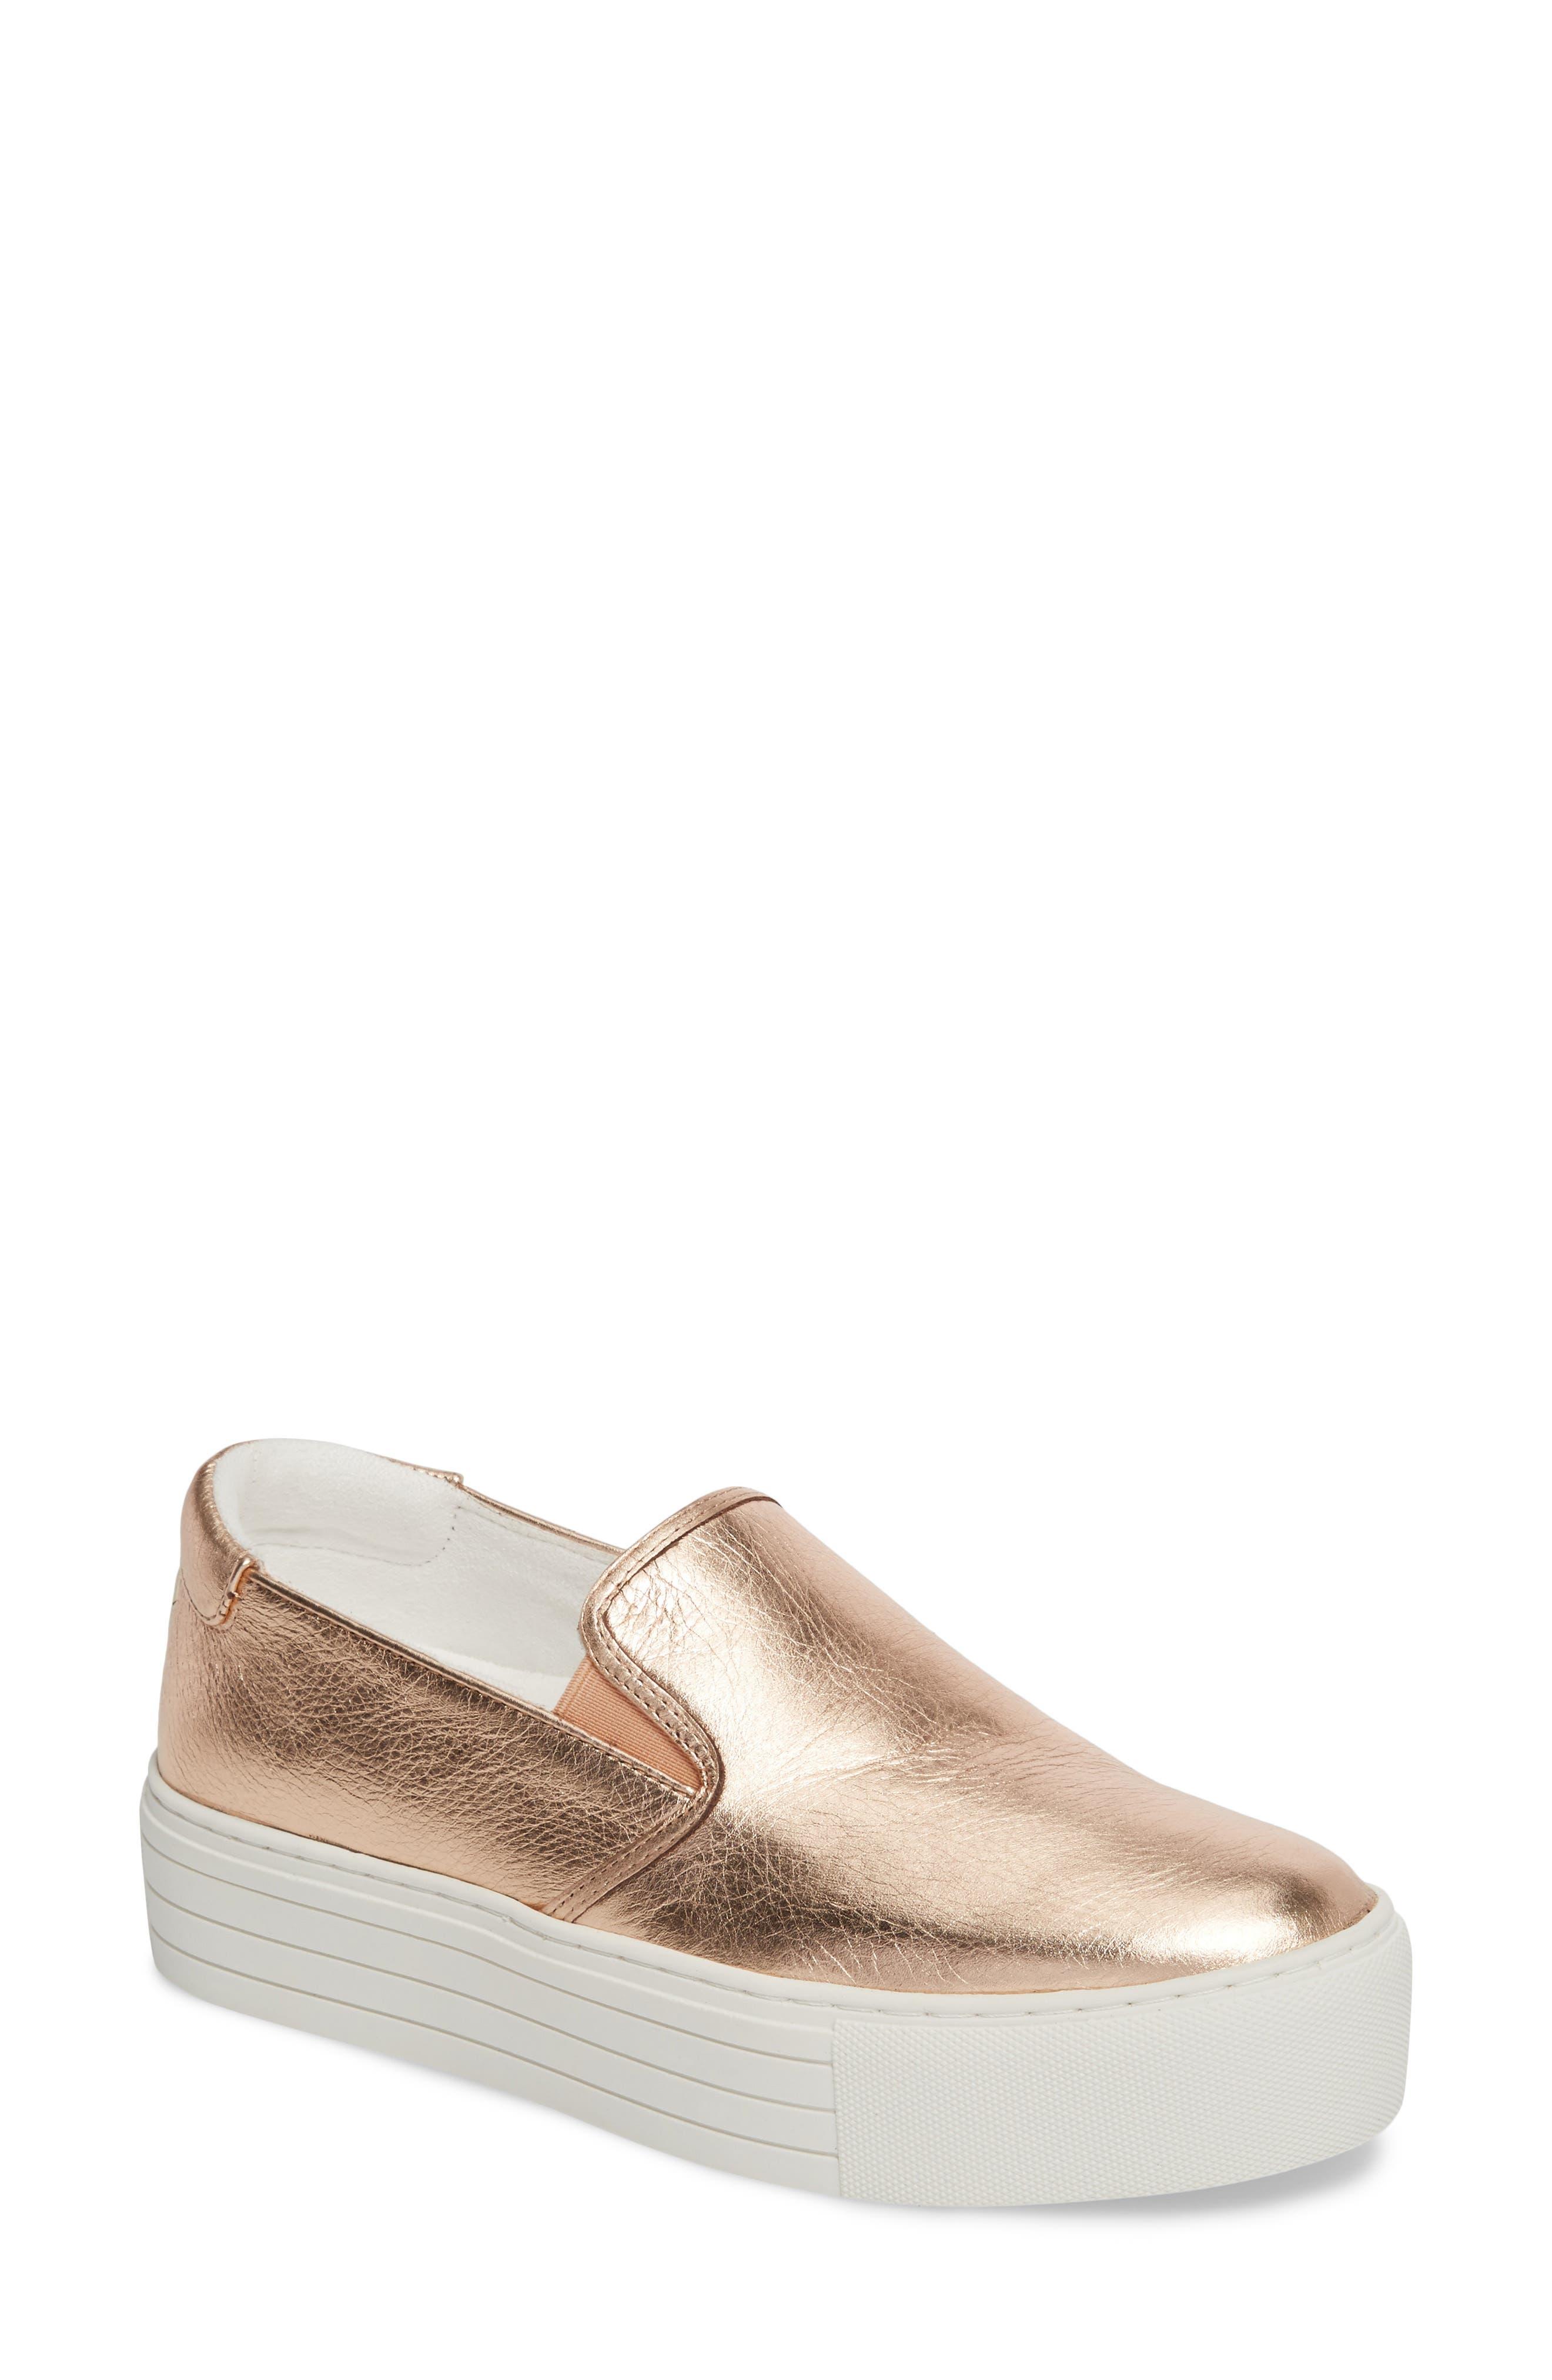 Joanie Slip-On Platform Sneaker,                             Main thumbnail 5, color,